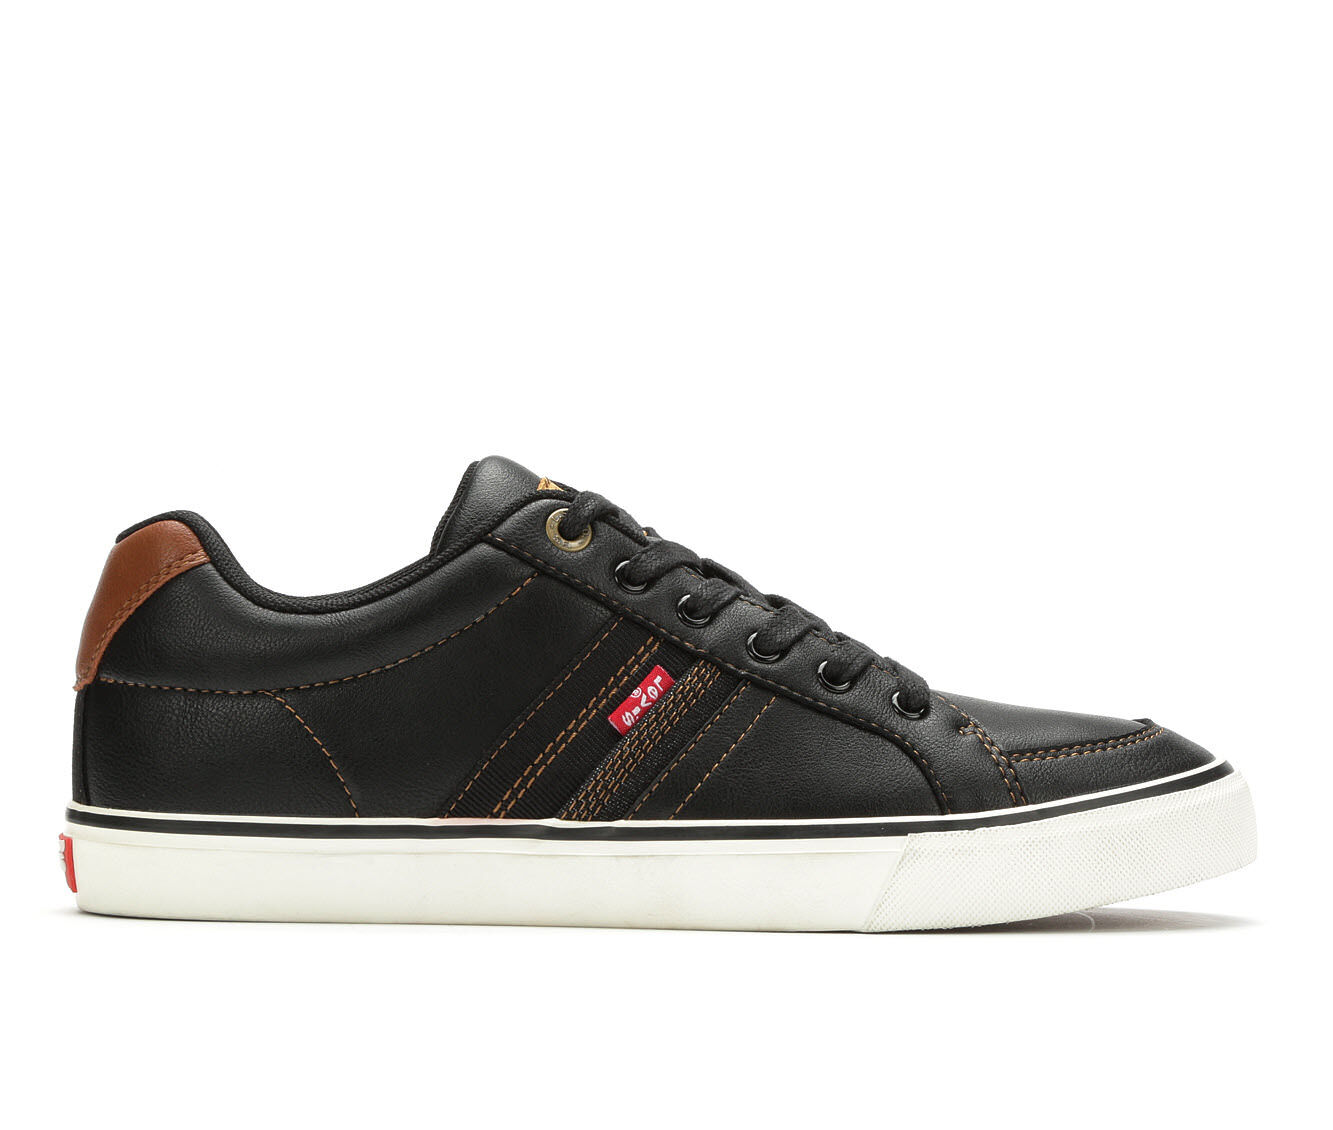 Men's Levis Turner Nappa Sneakers Black